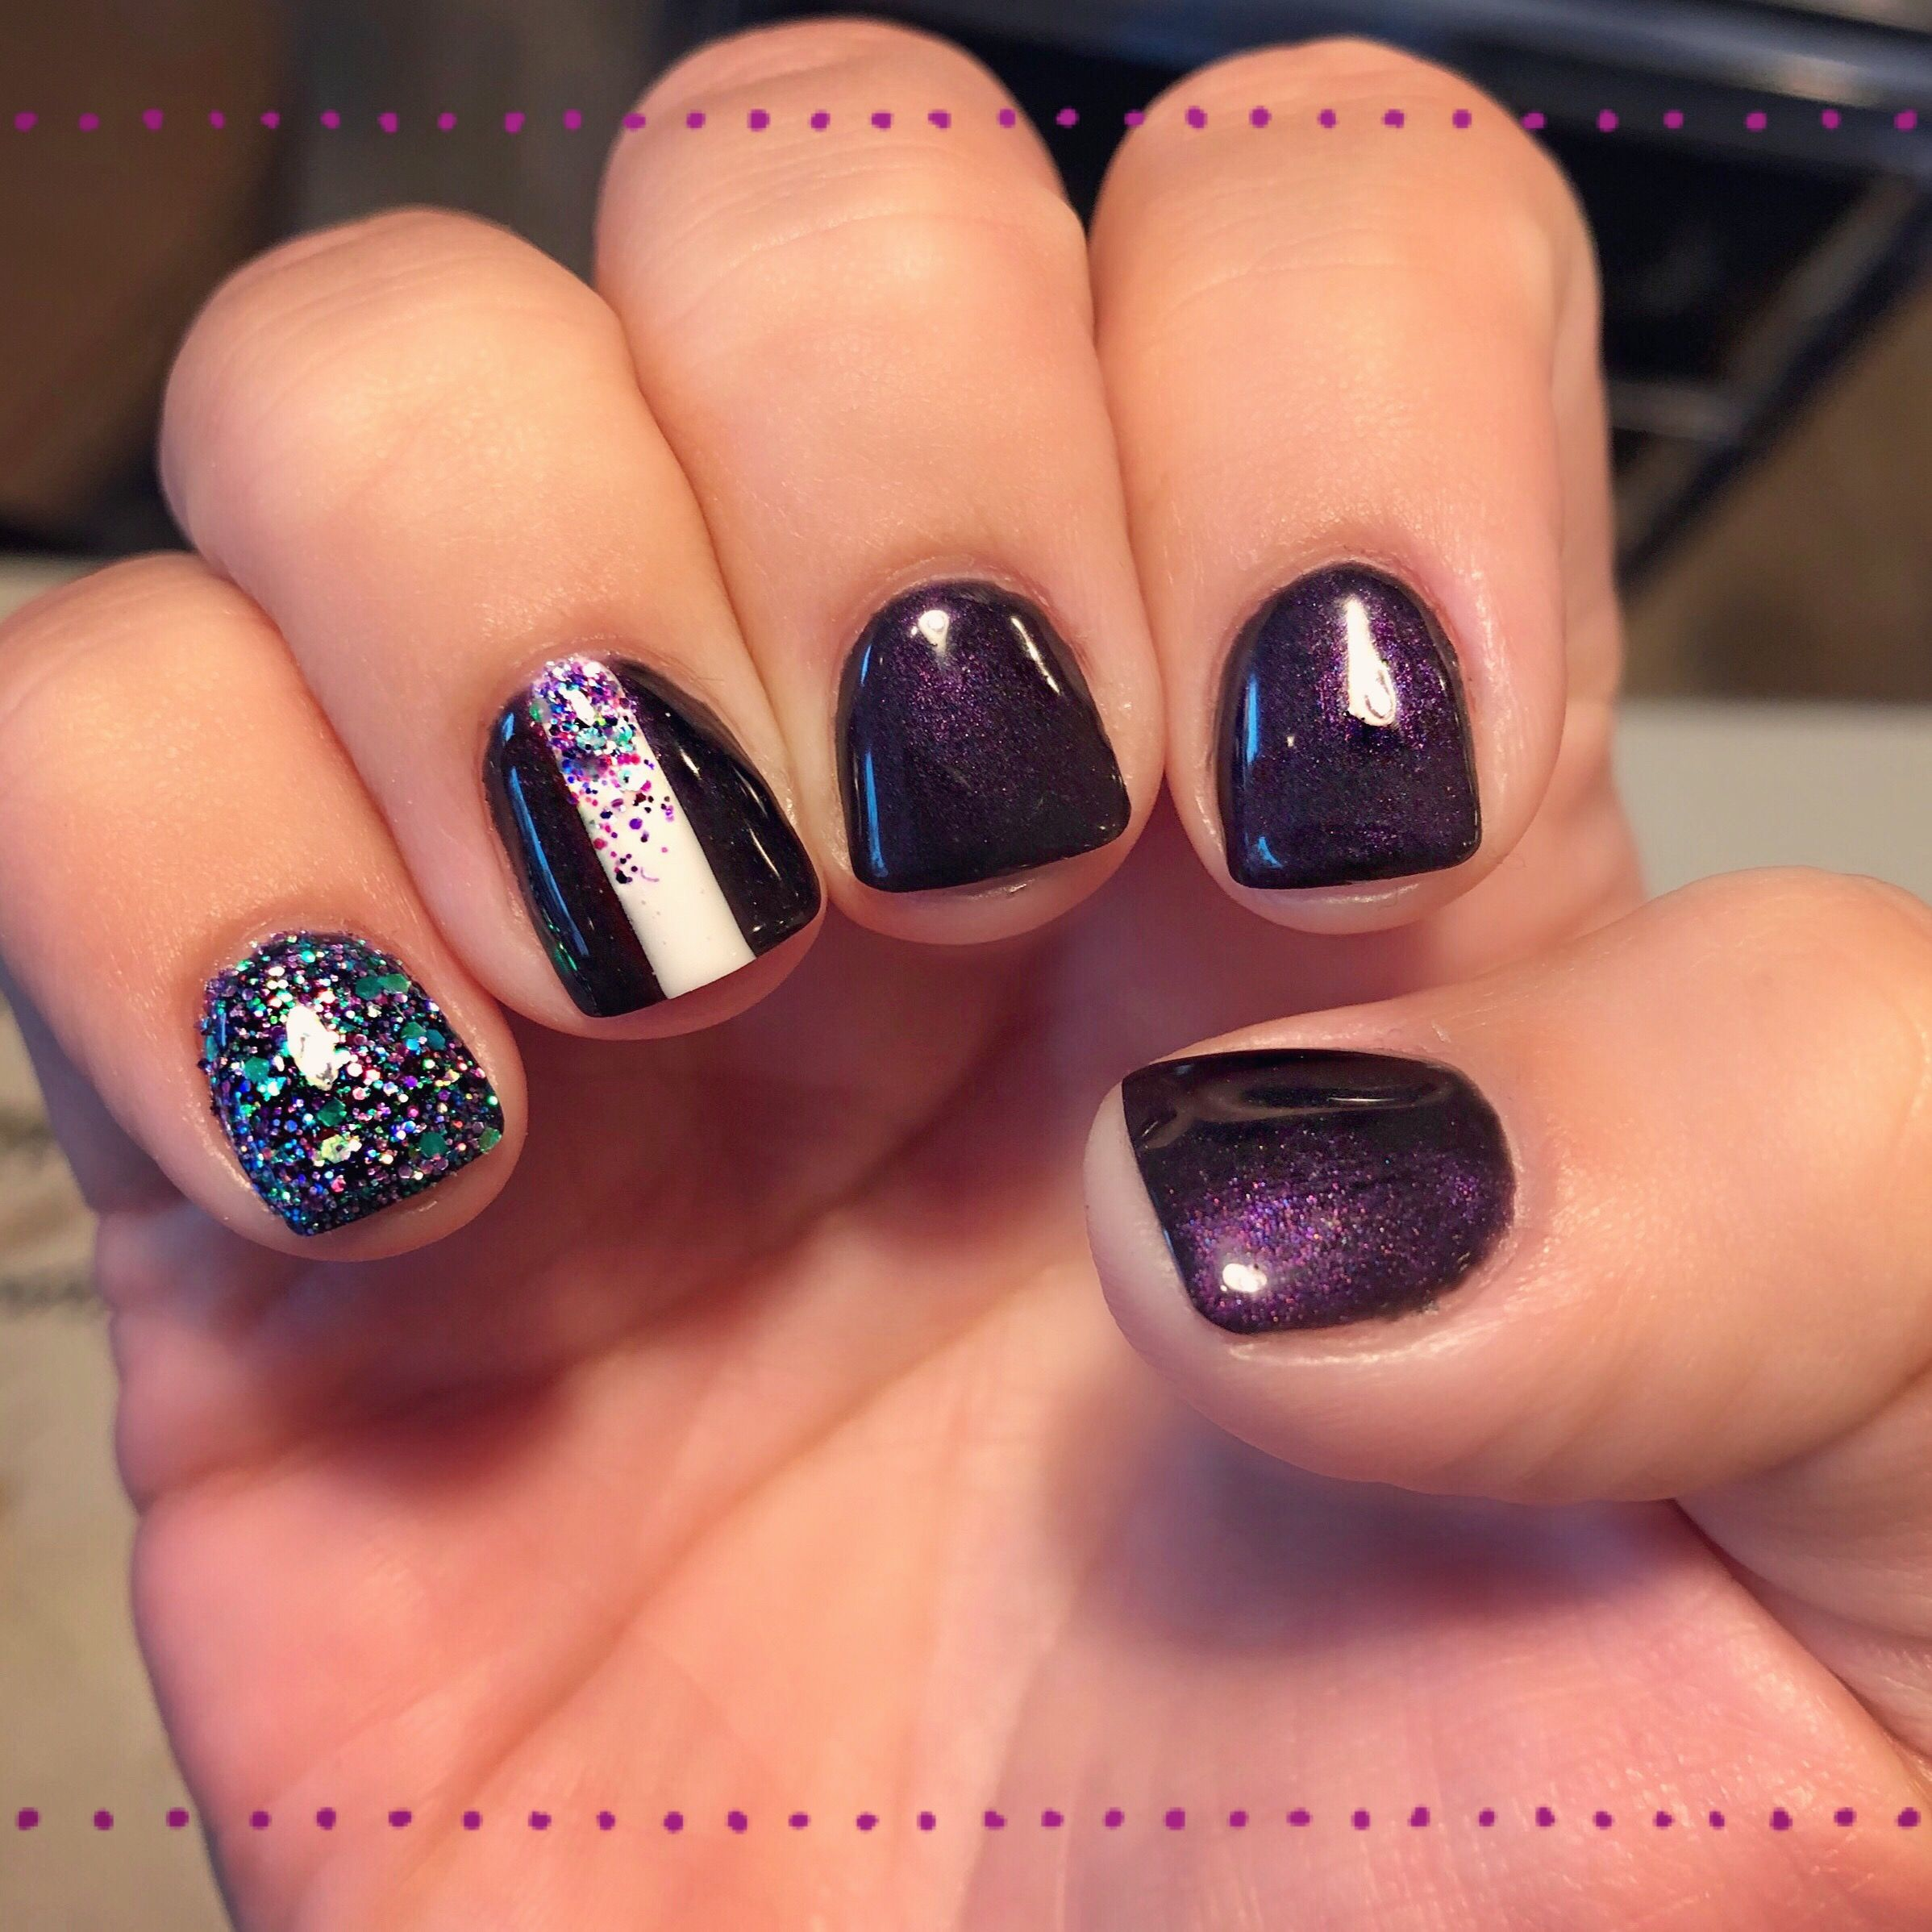 Dark purple glitter nail art gel manicure   Nail art   Pinterest ...